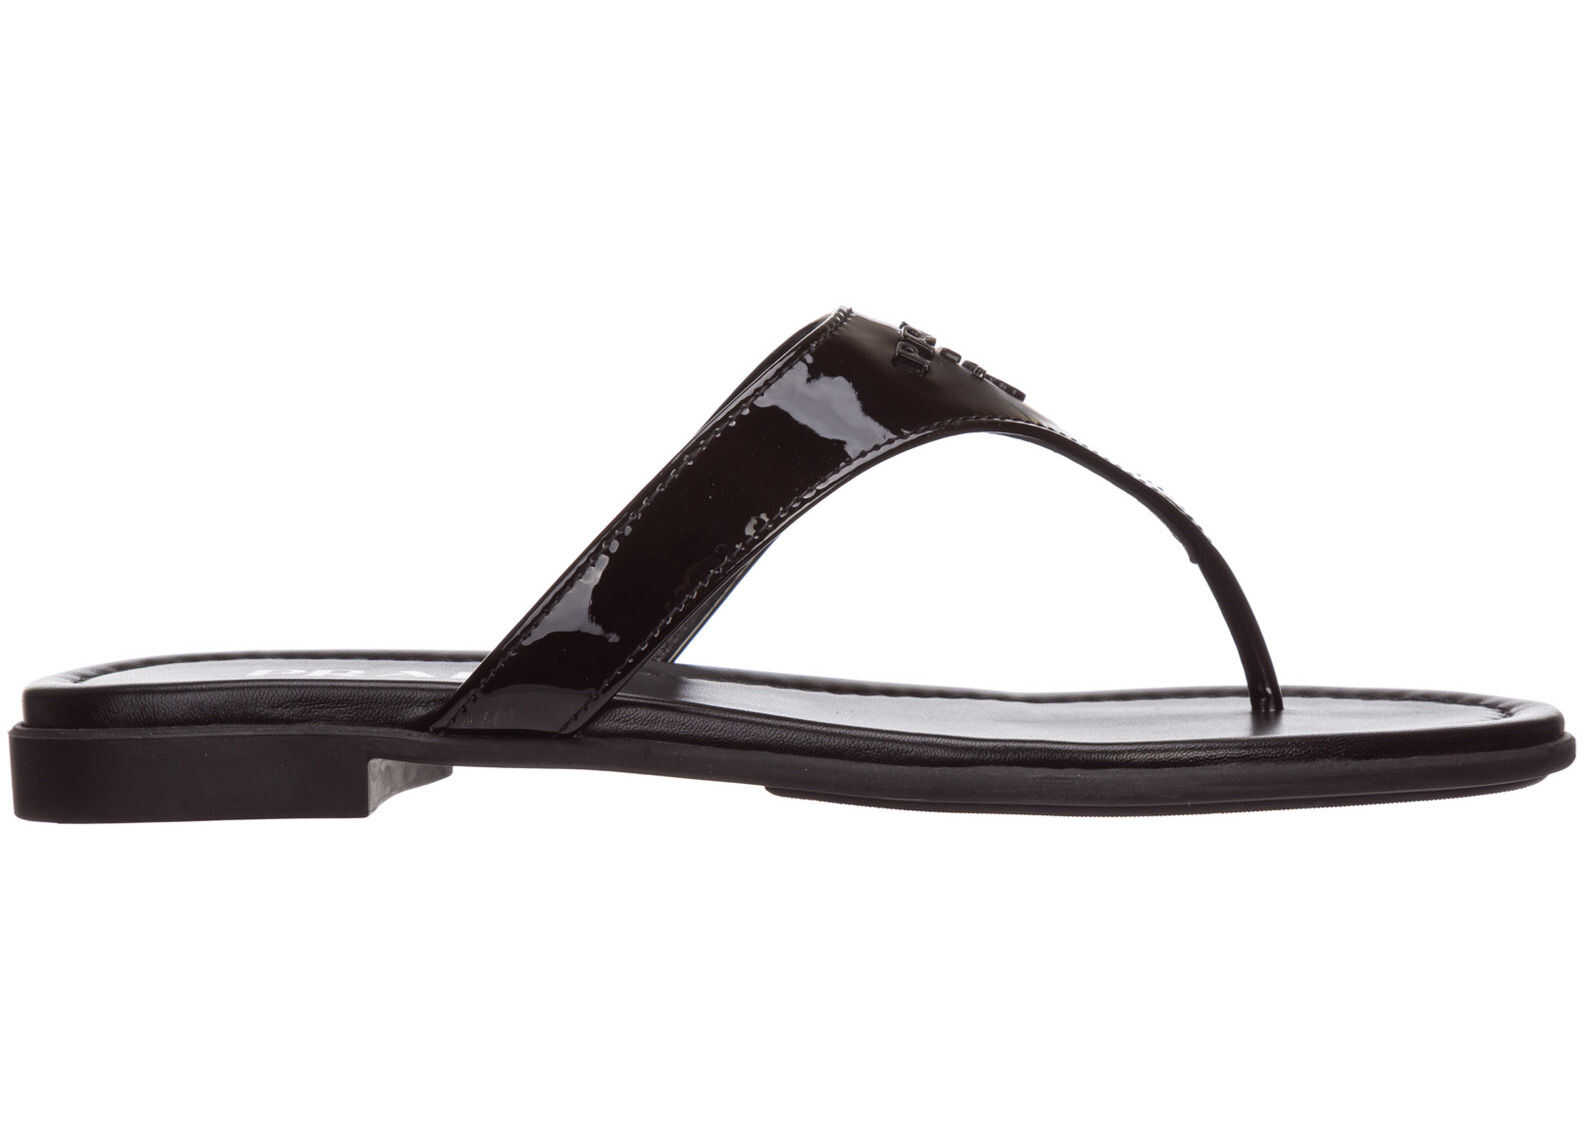 Prada Flops Sandals Black